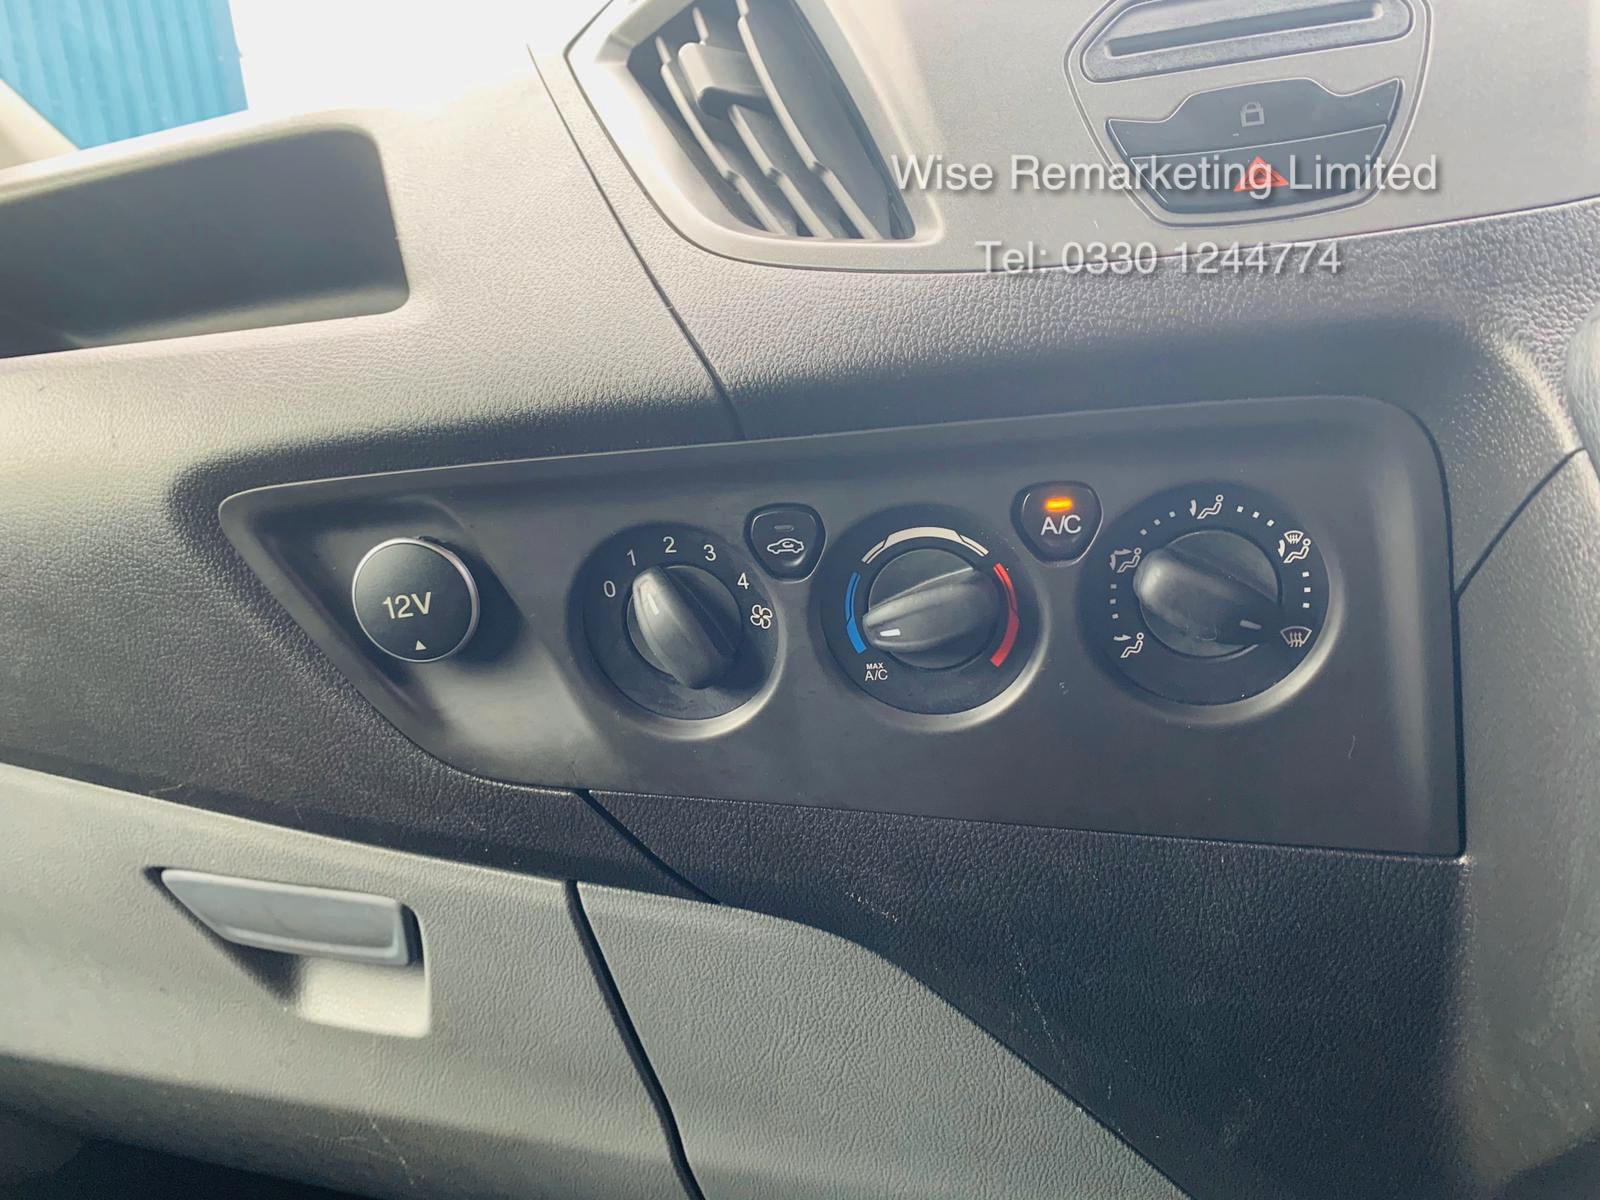 Ford Transit Custom 2.2 TDCI 290 **HIGH ROOF** - 2016 Model - AIR CON- 1 OWNER- FSH- RARE VAN!! - Image 17 of 24